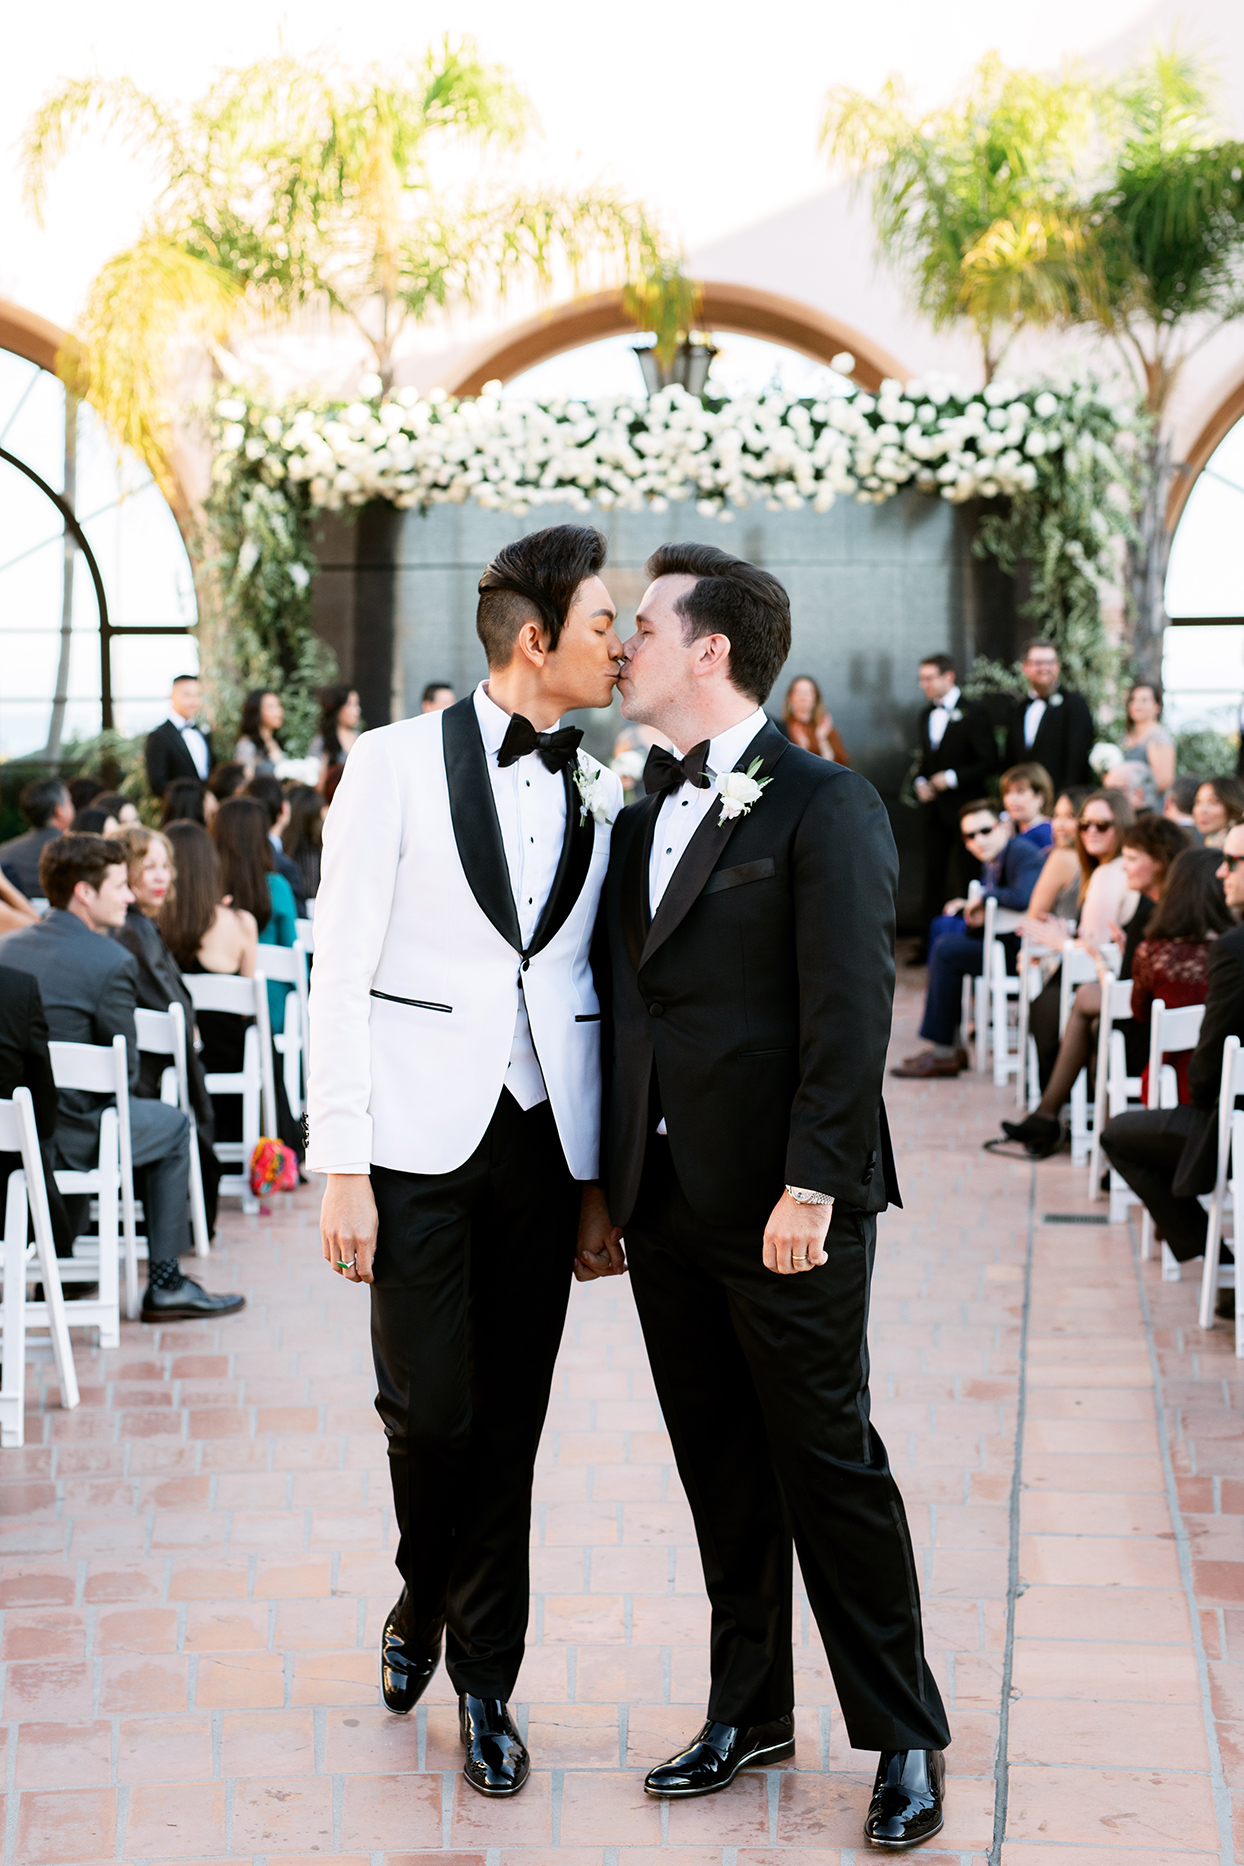 jason justin wedding ceremony couple kiss